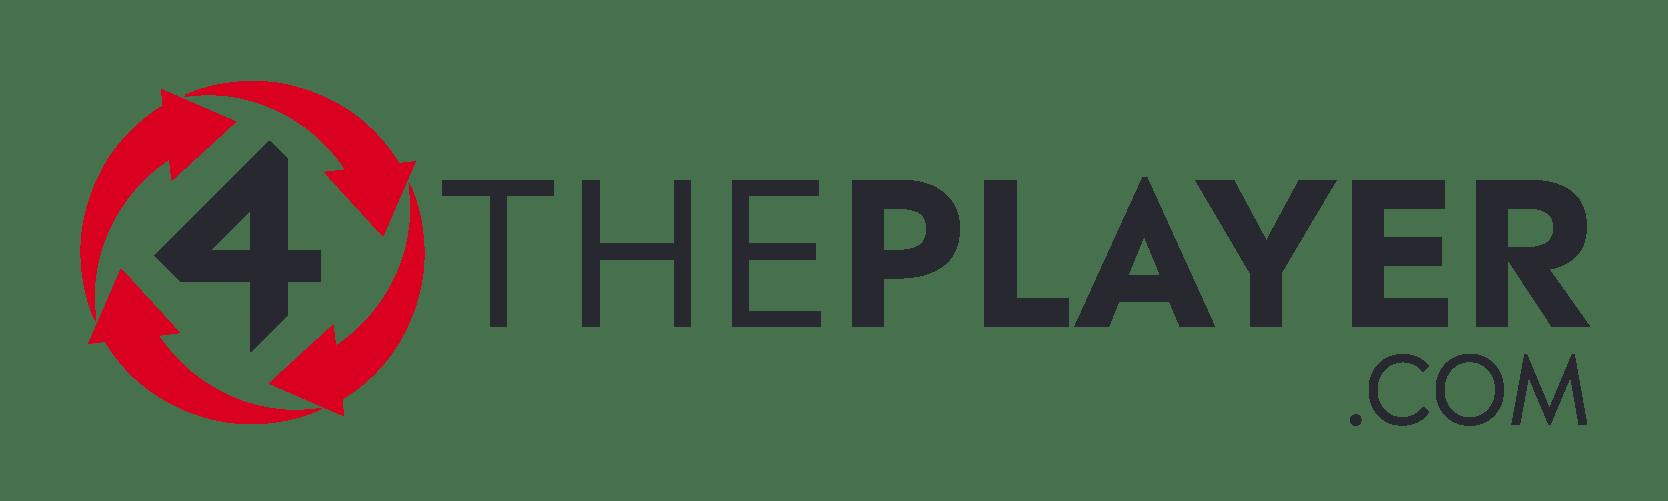 4ThePlayer 游戏